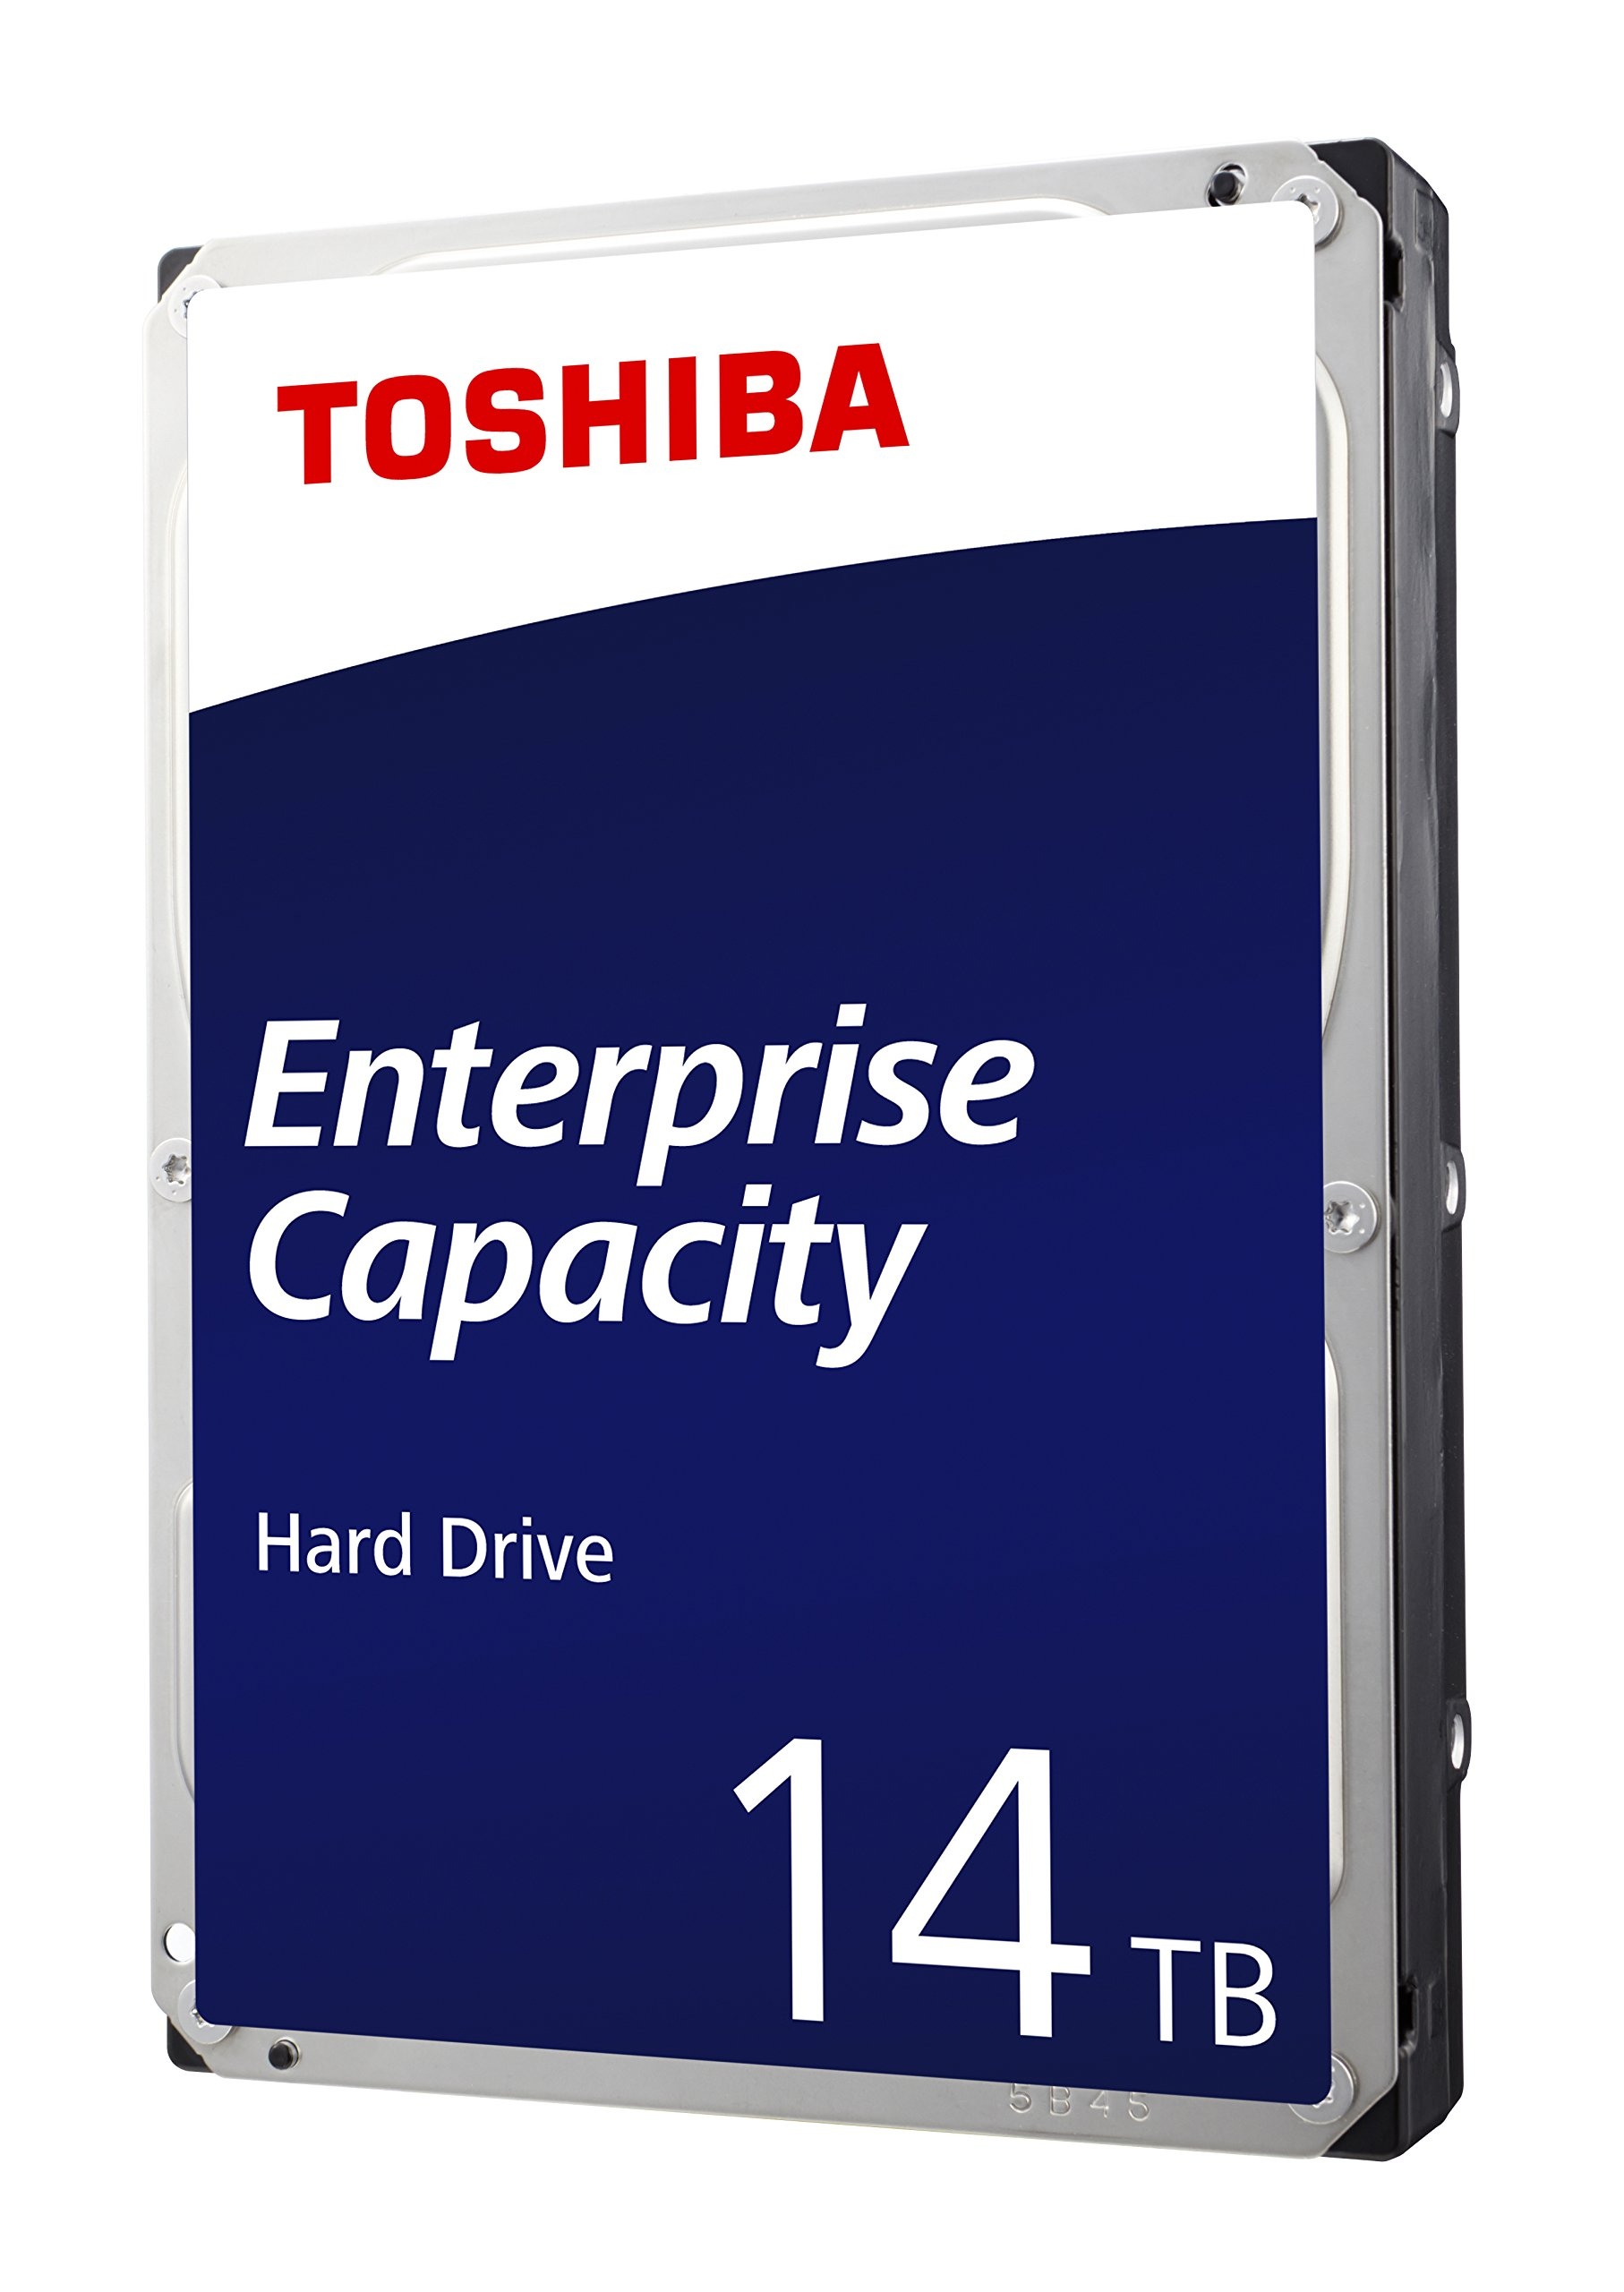 Toshiba 14TB SATA 512e 3.5'' 7200RPM Enterprise HDD - MG07ACA14TE by Toshiba (Image #2)